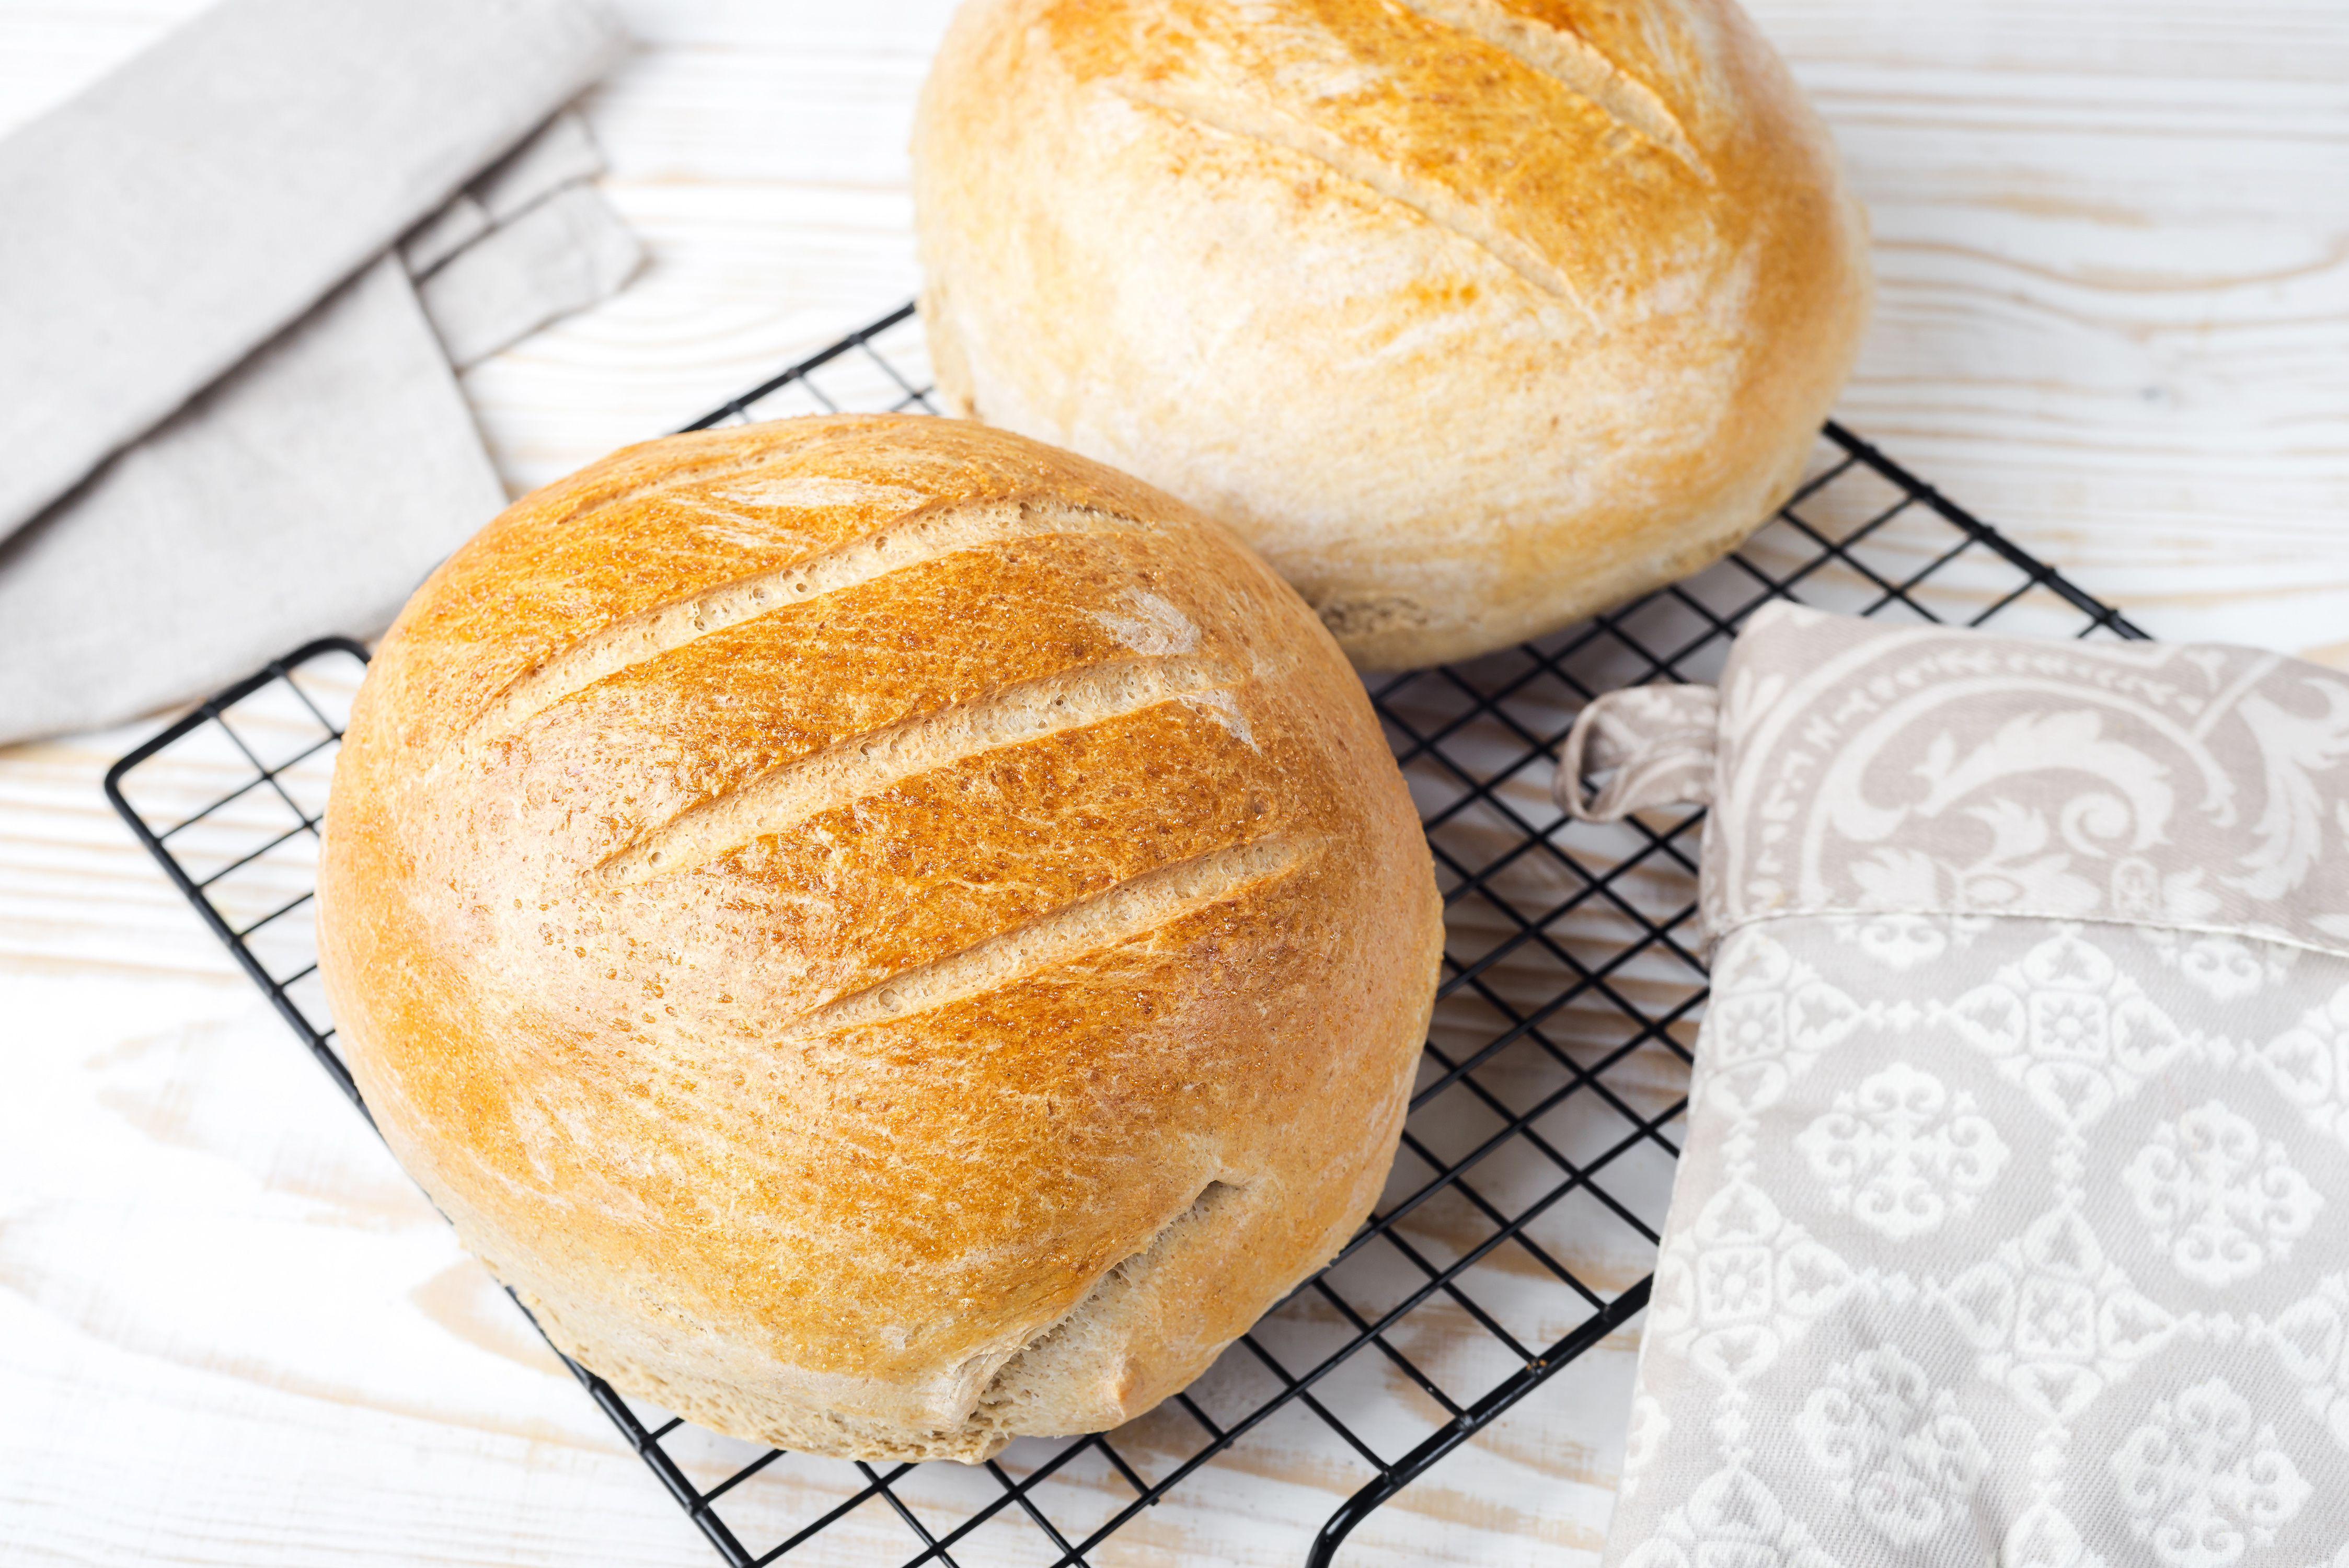 Baked dough